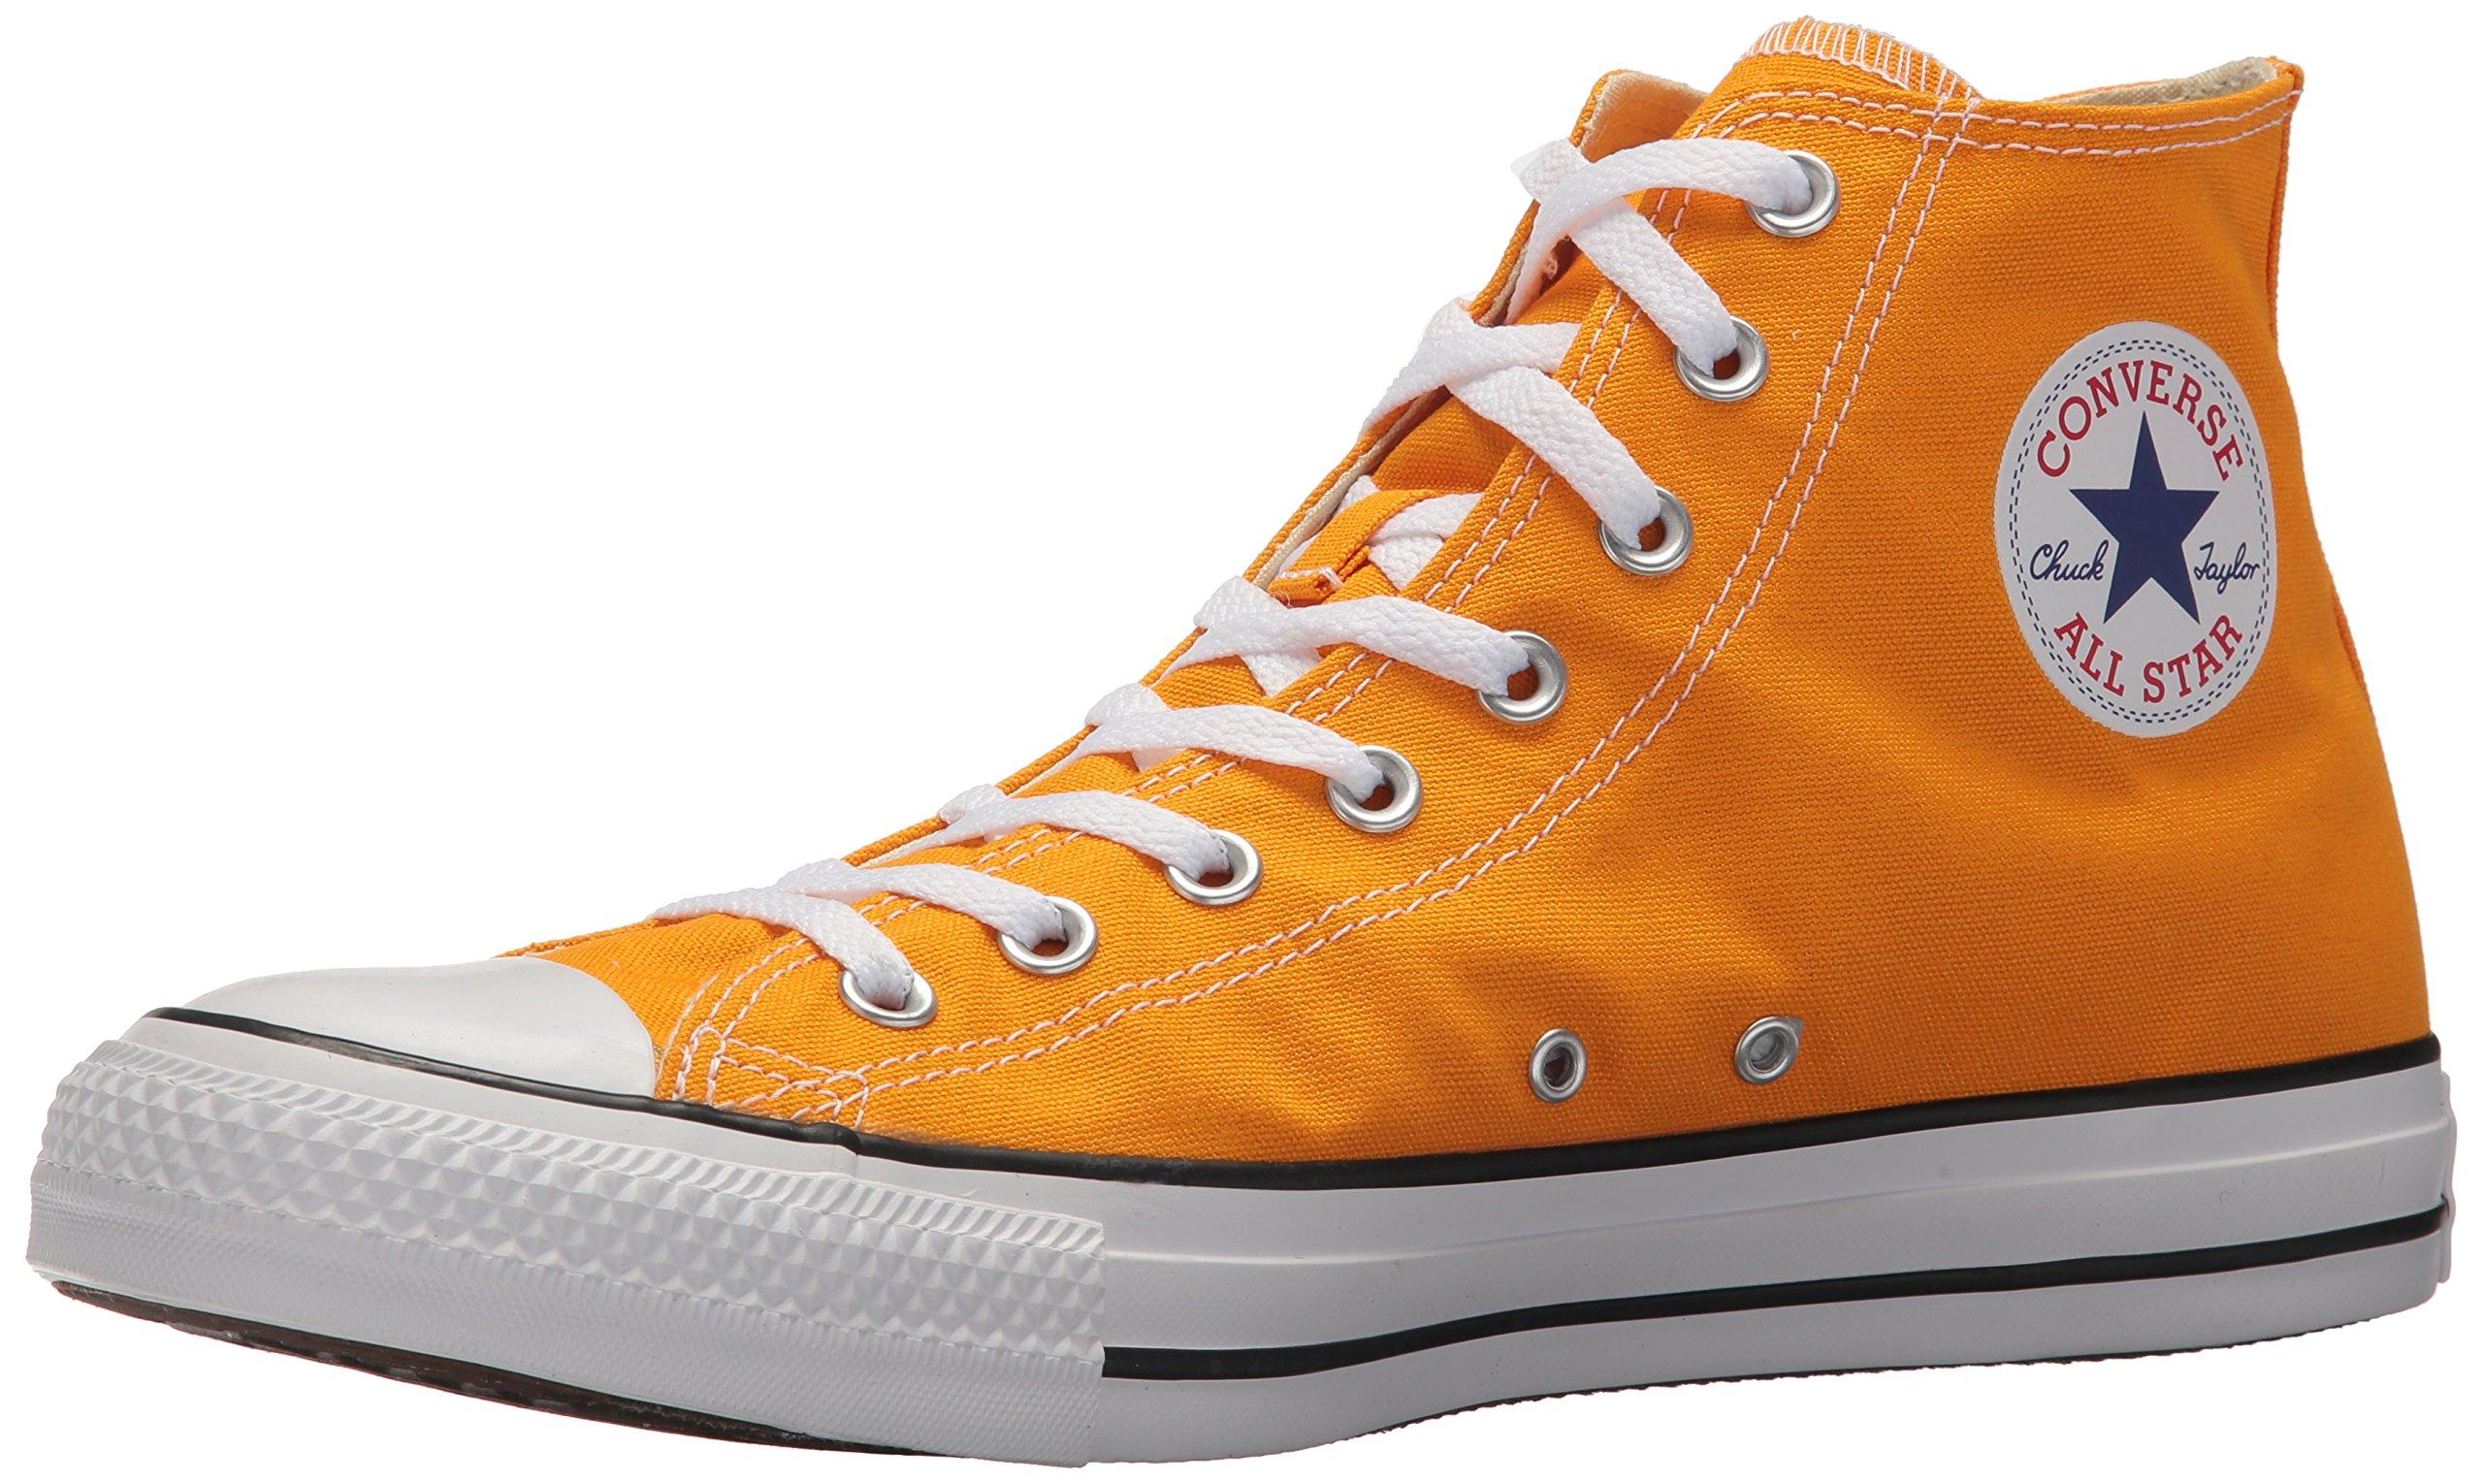 97cd9024da8 Galleon - Converse Chuck Taylor All Star Seasonal Canvas High Top Sneaker